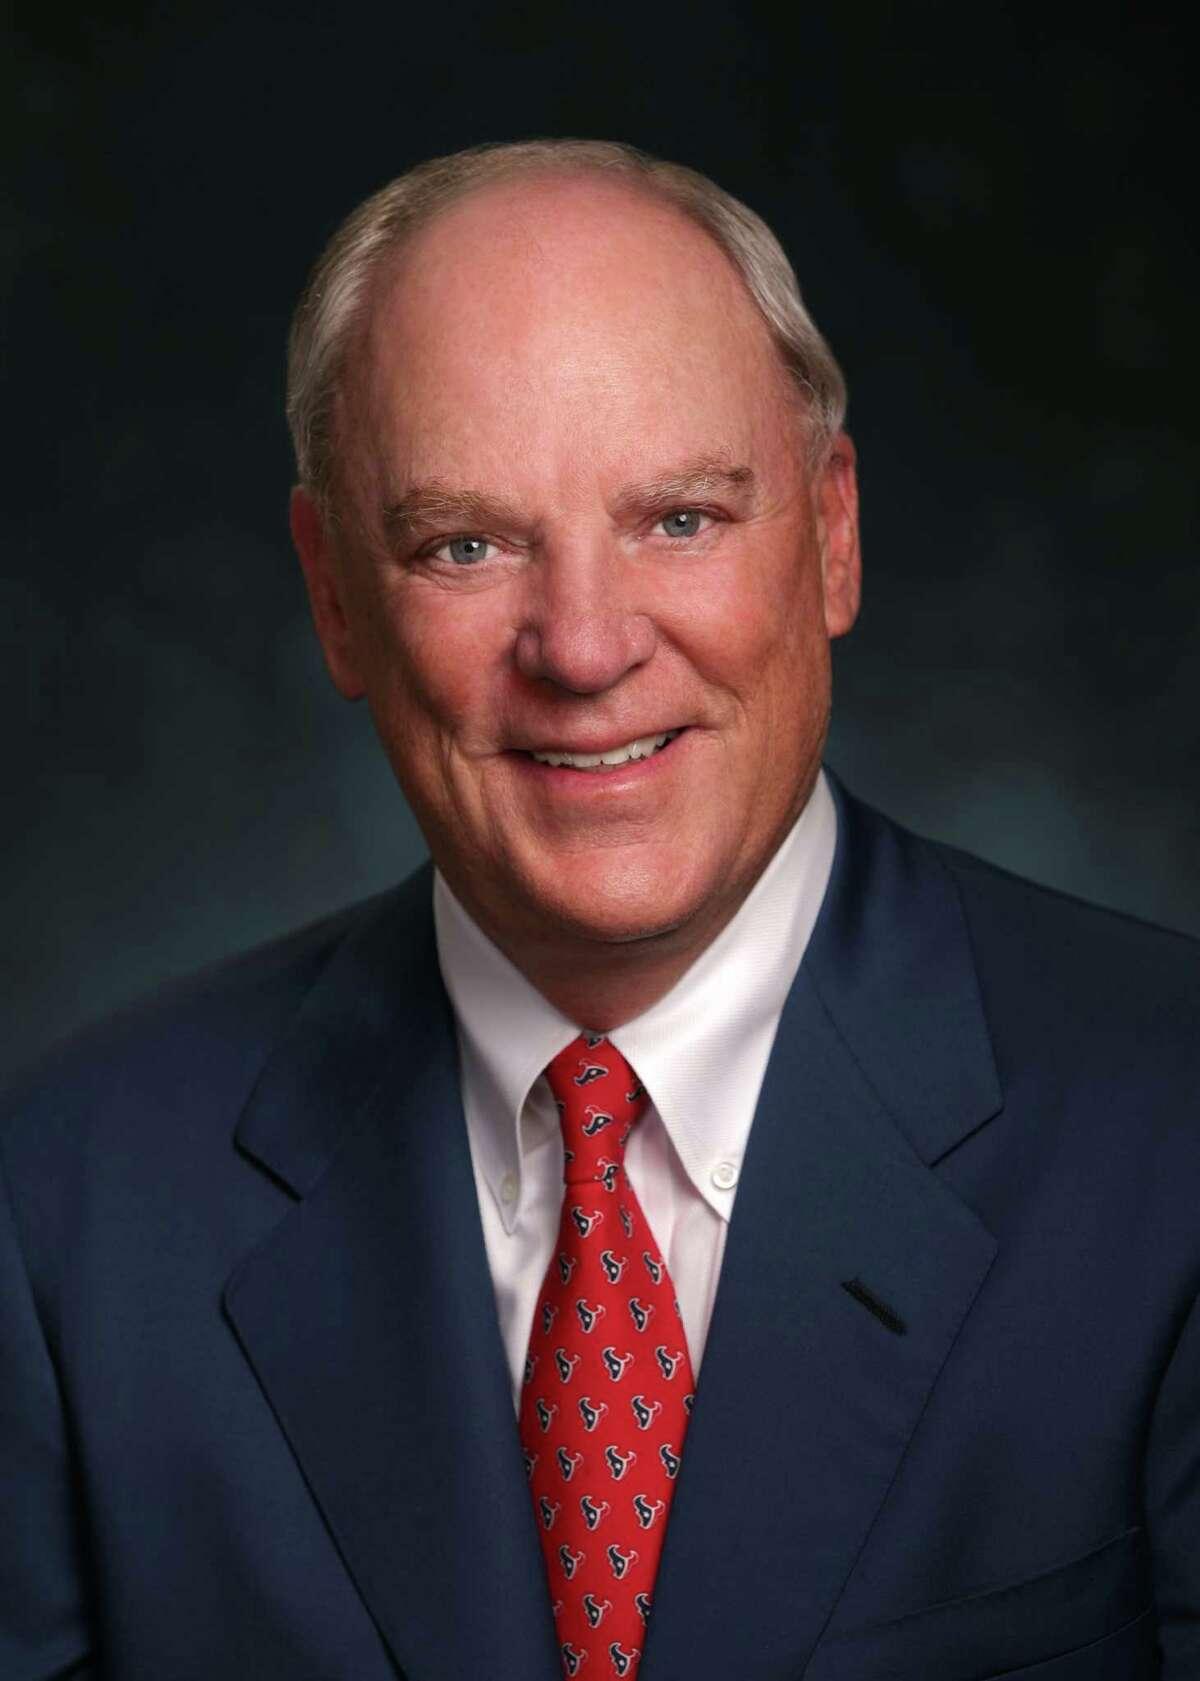 Bob McNair Texans owner and Houston businessman Photo courtesy of Houston Texans